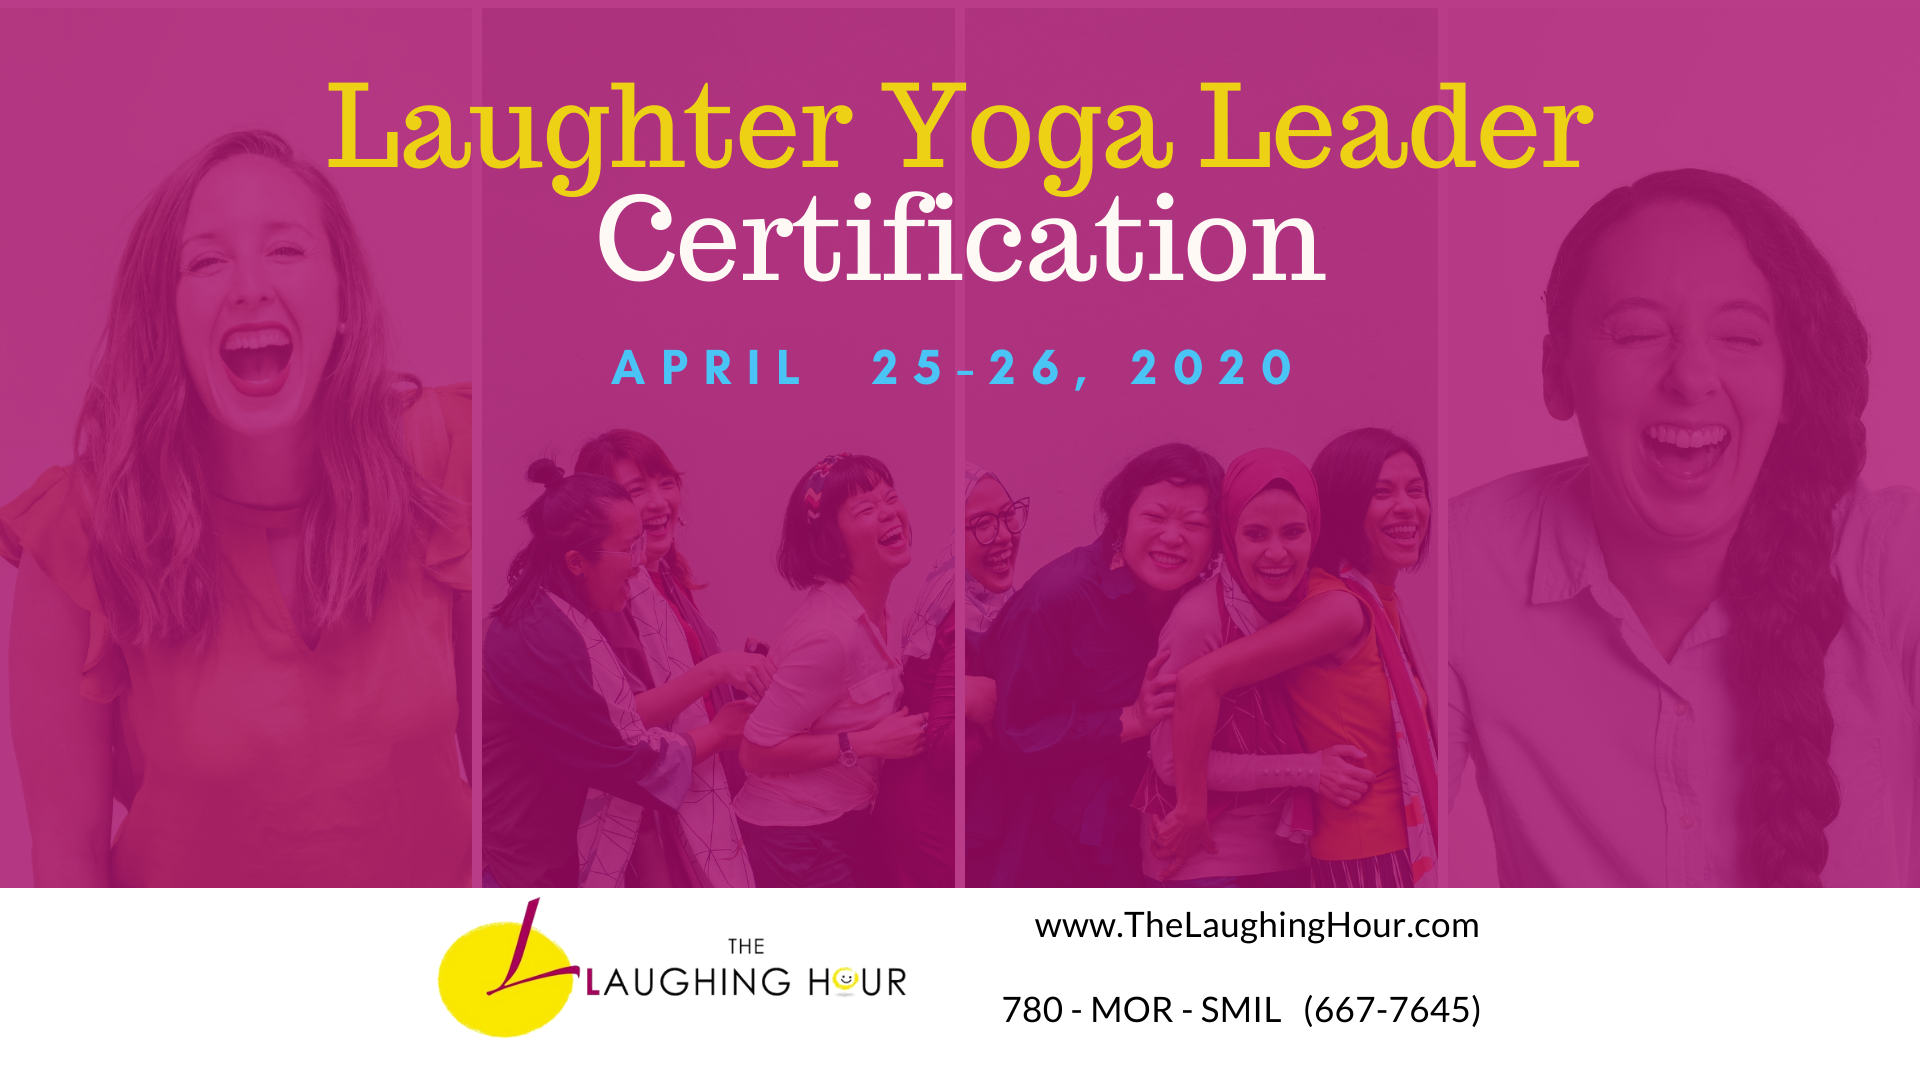 Laughter Yoga Leader Certification - 2020